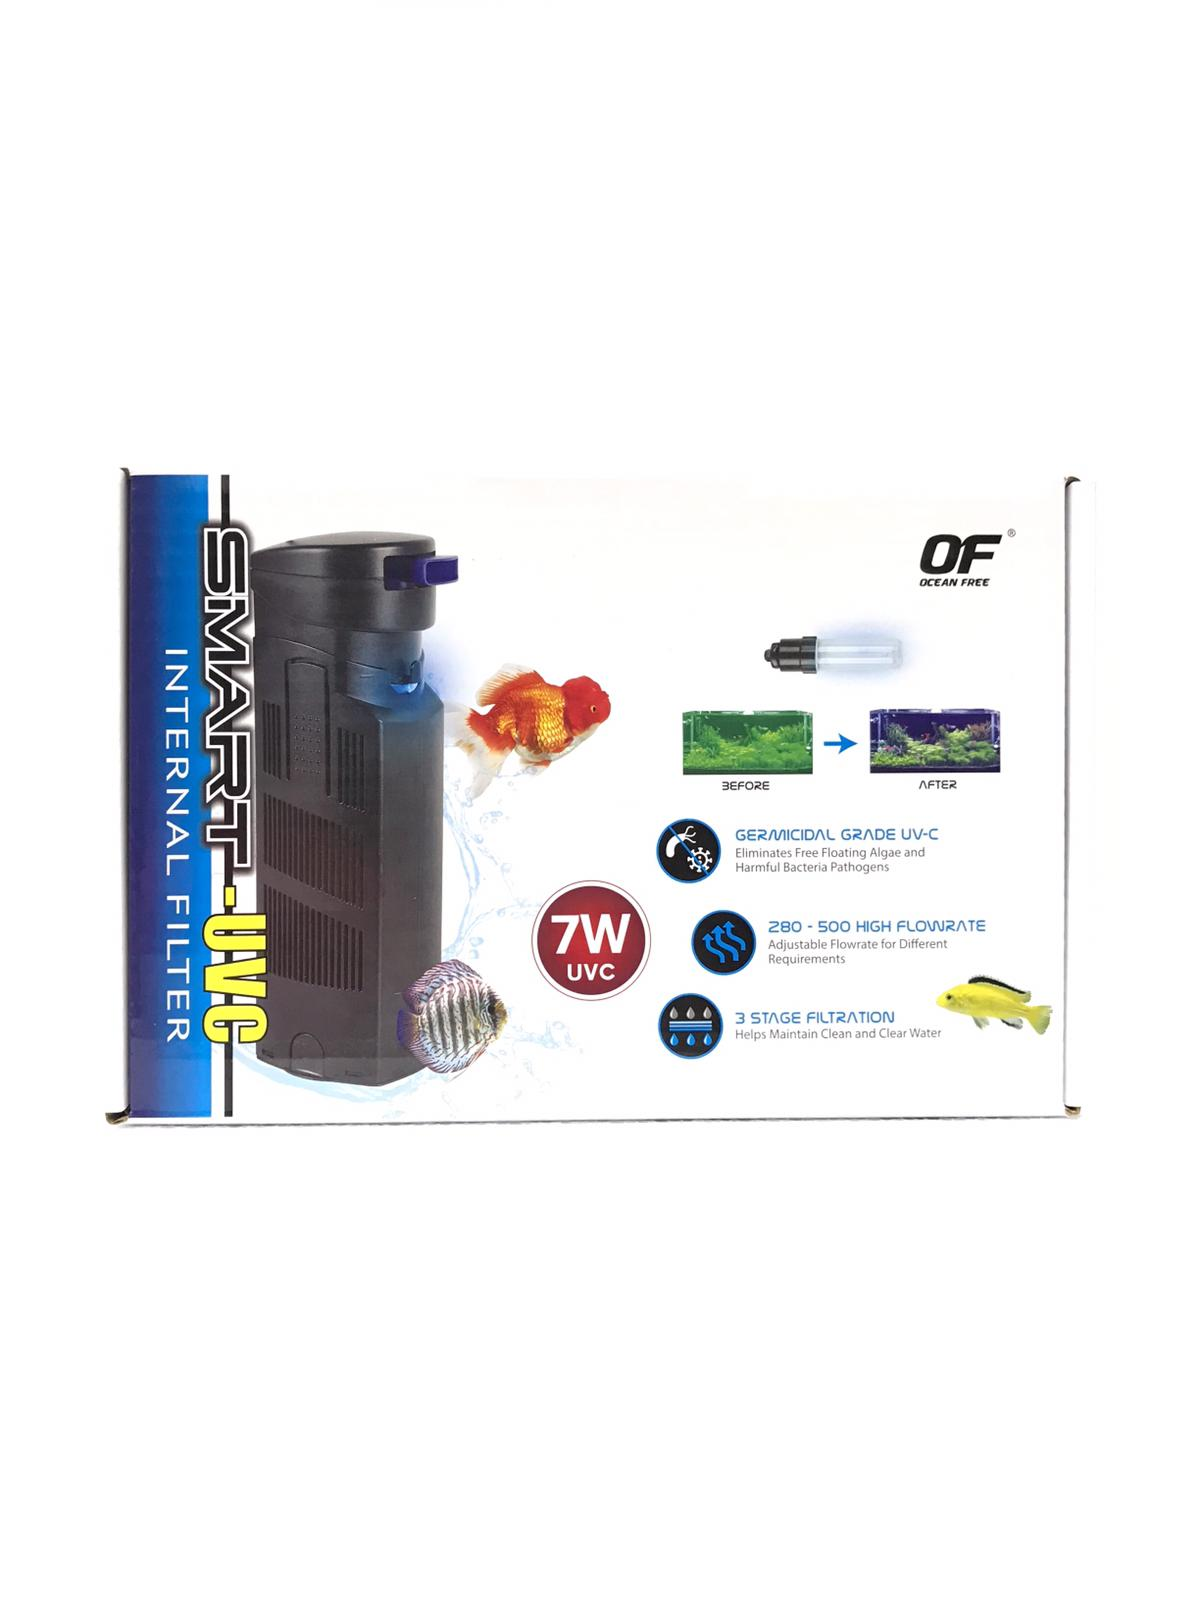 OF Smart UVC Internal Filter